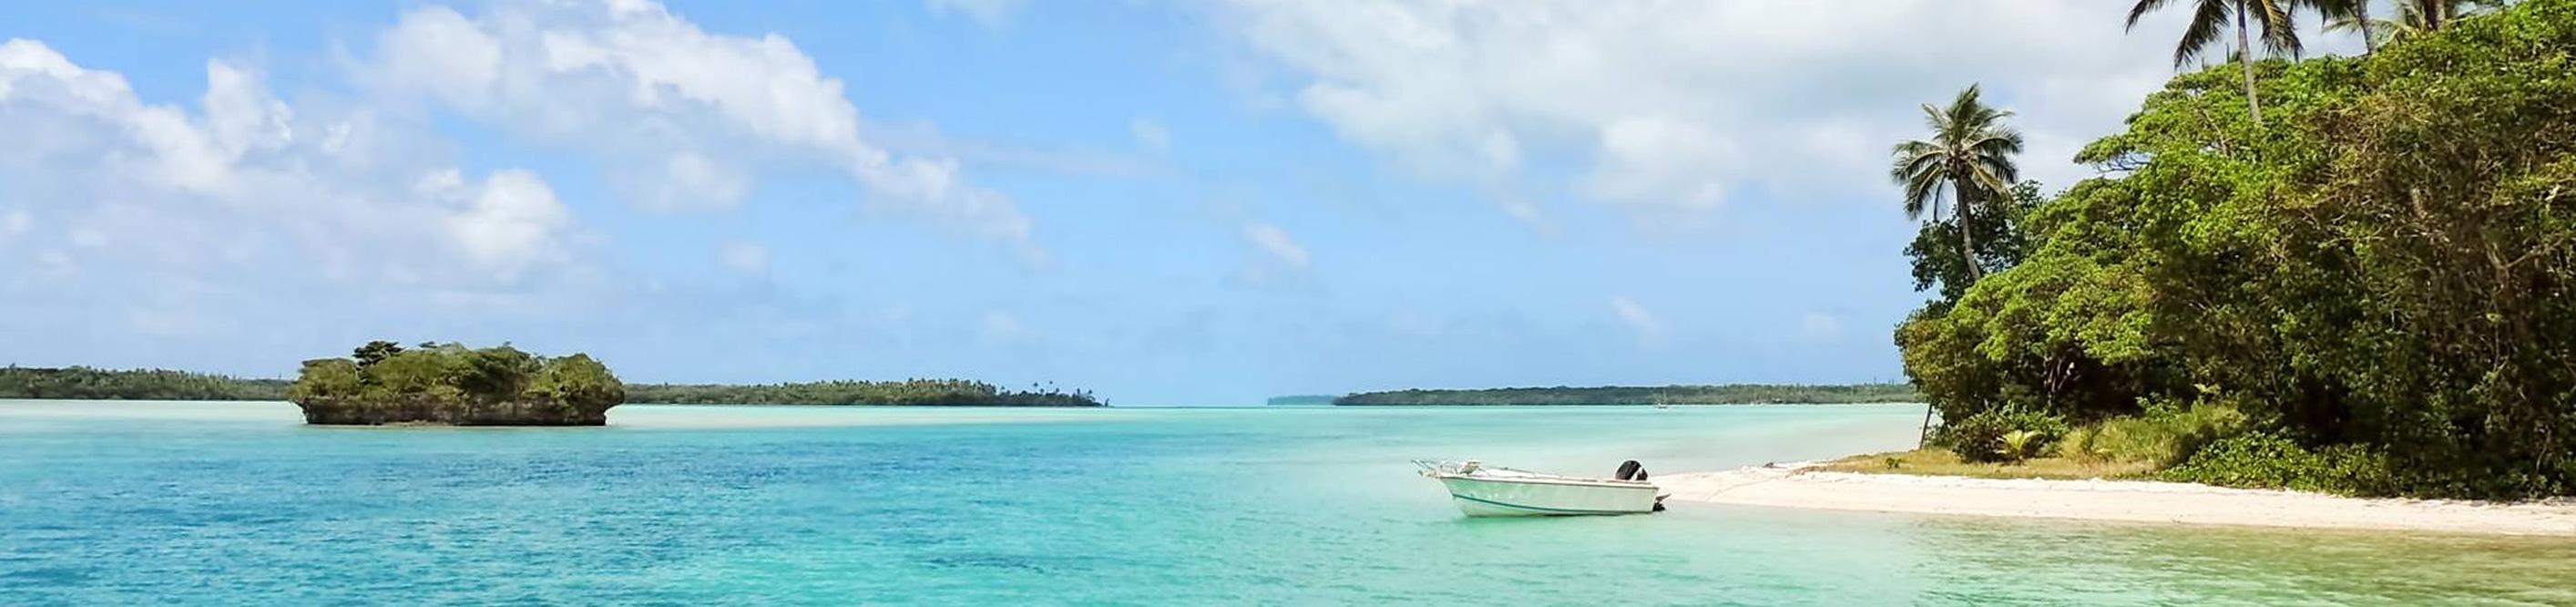 Парусные регаты на Карибах